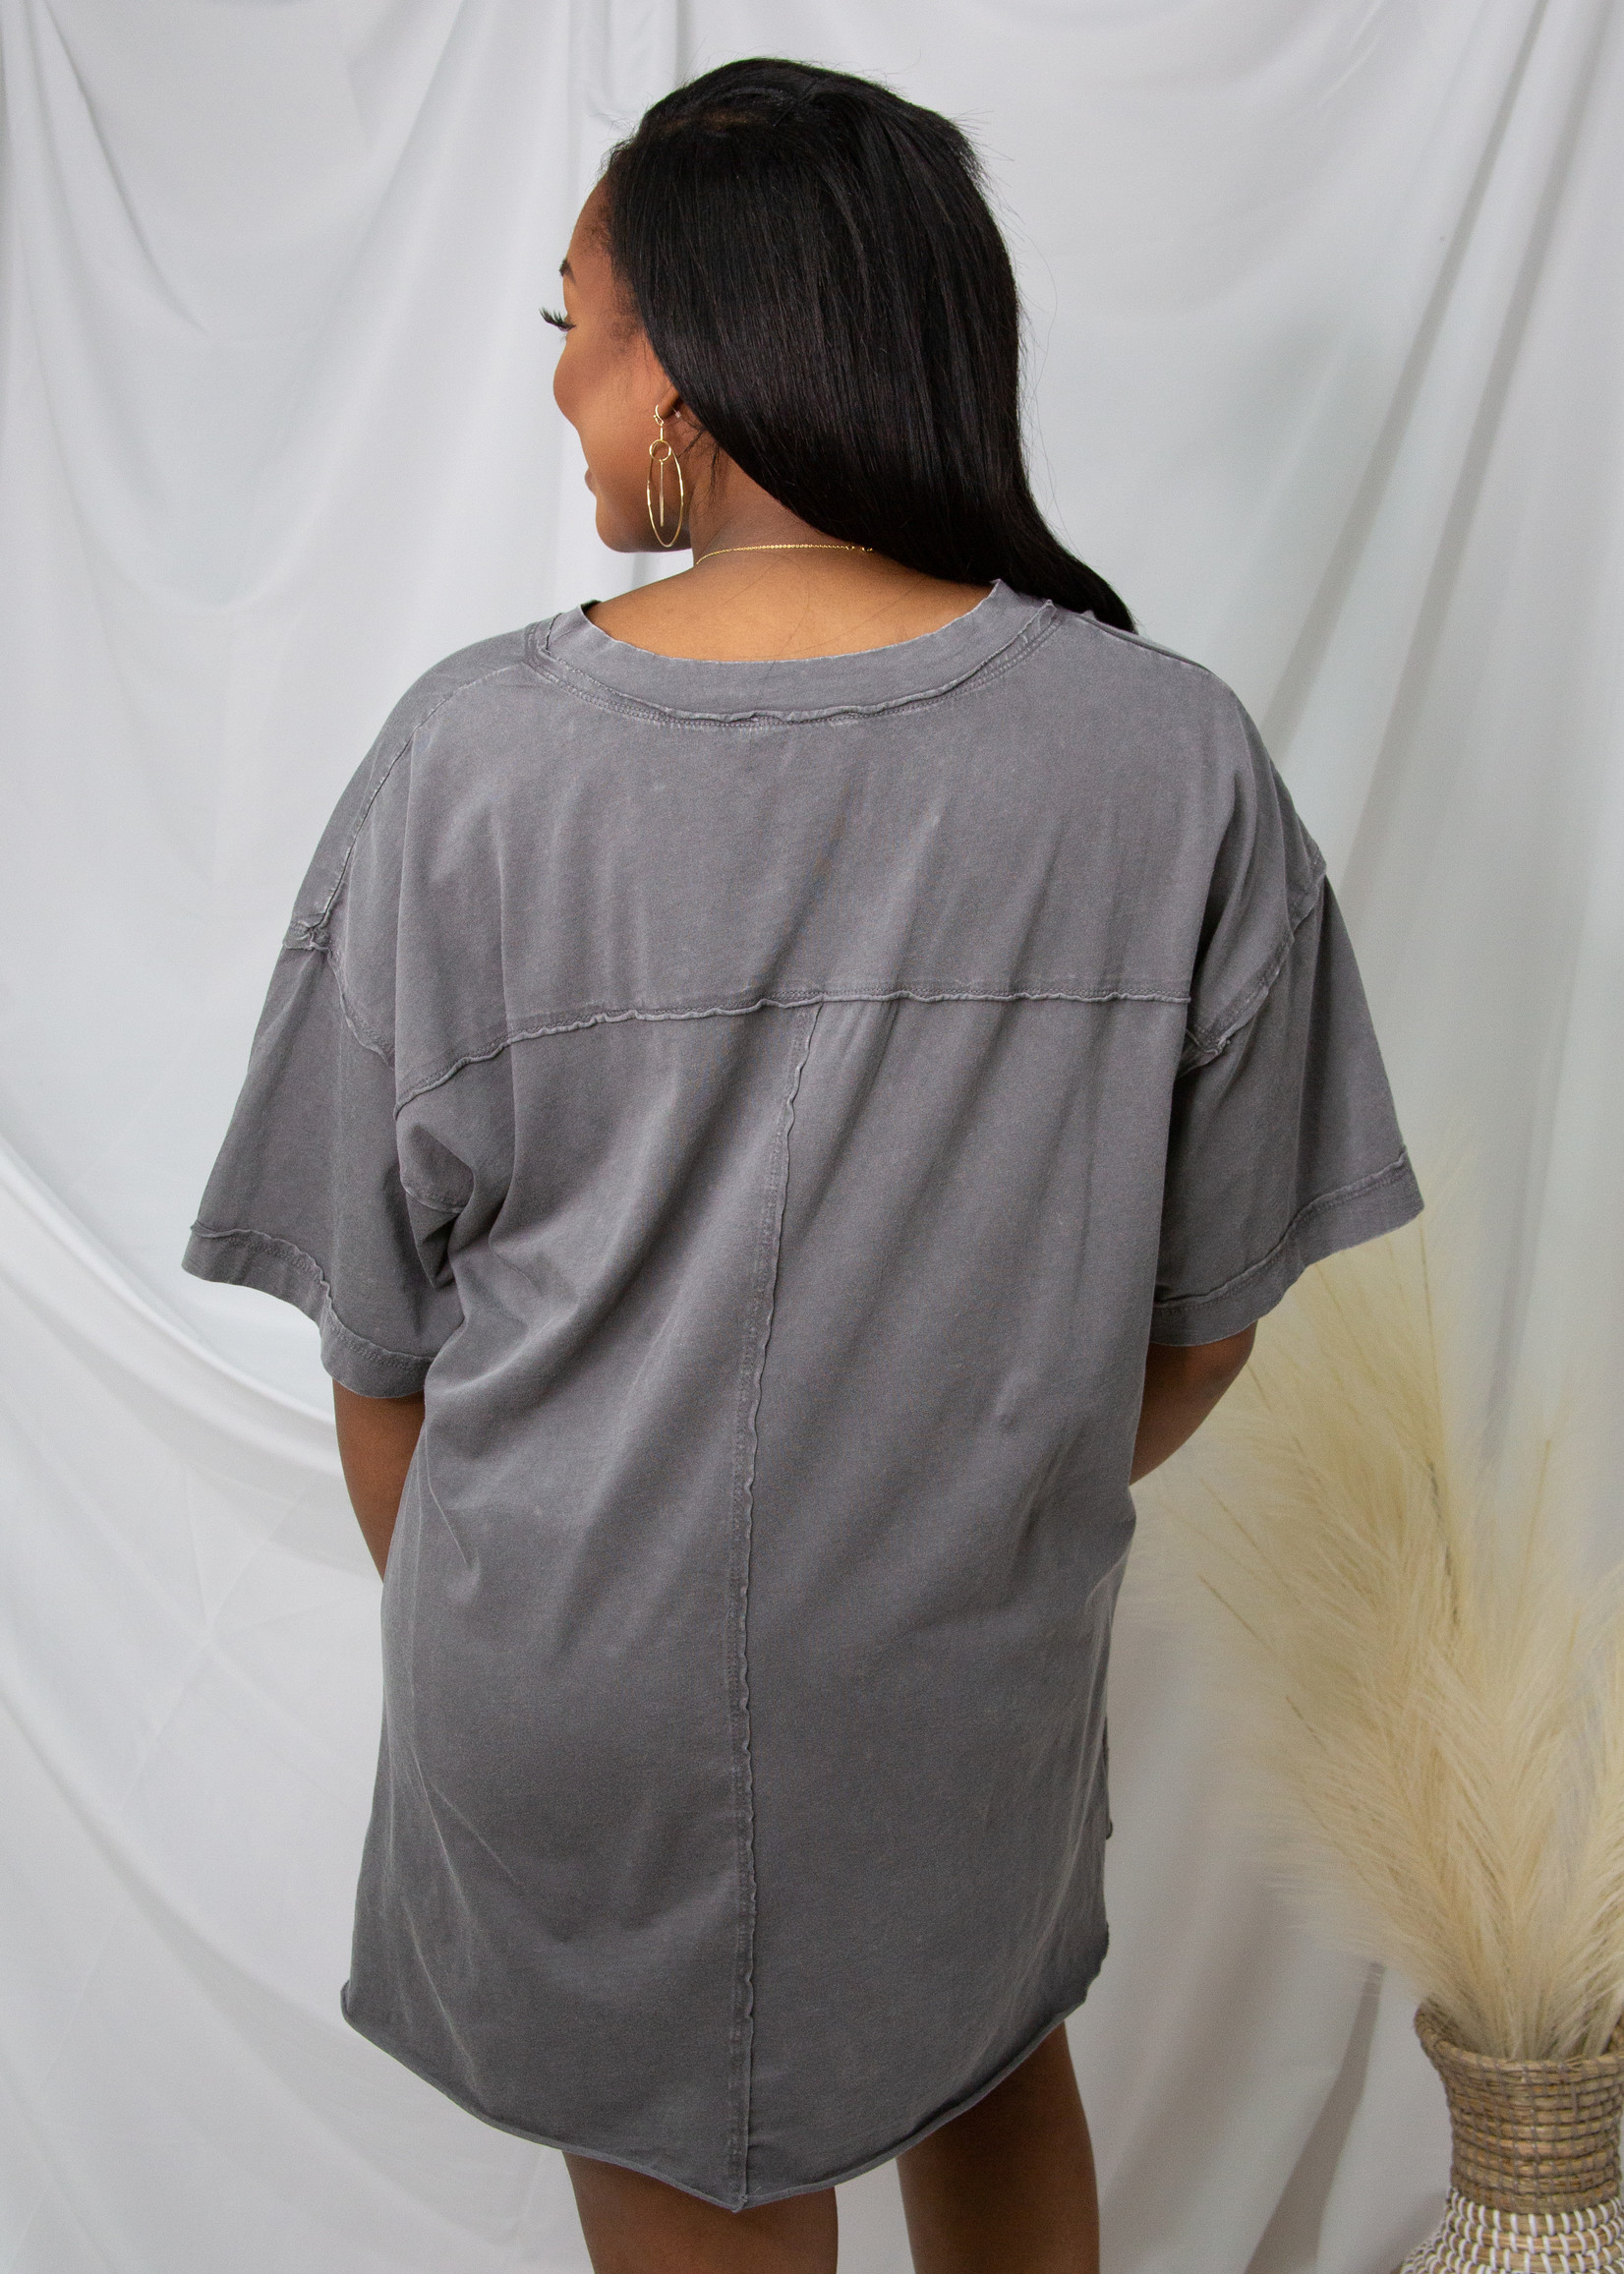 Short Sleeve V-Neck Cotton Top